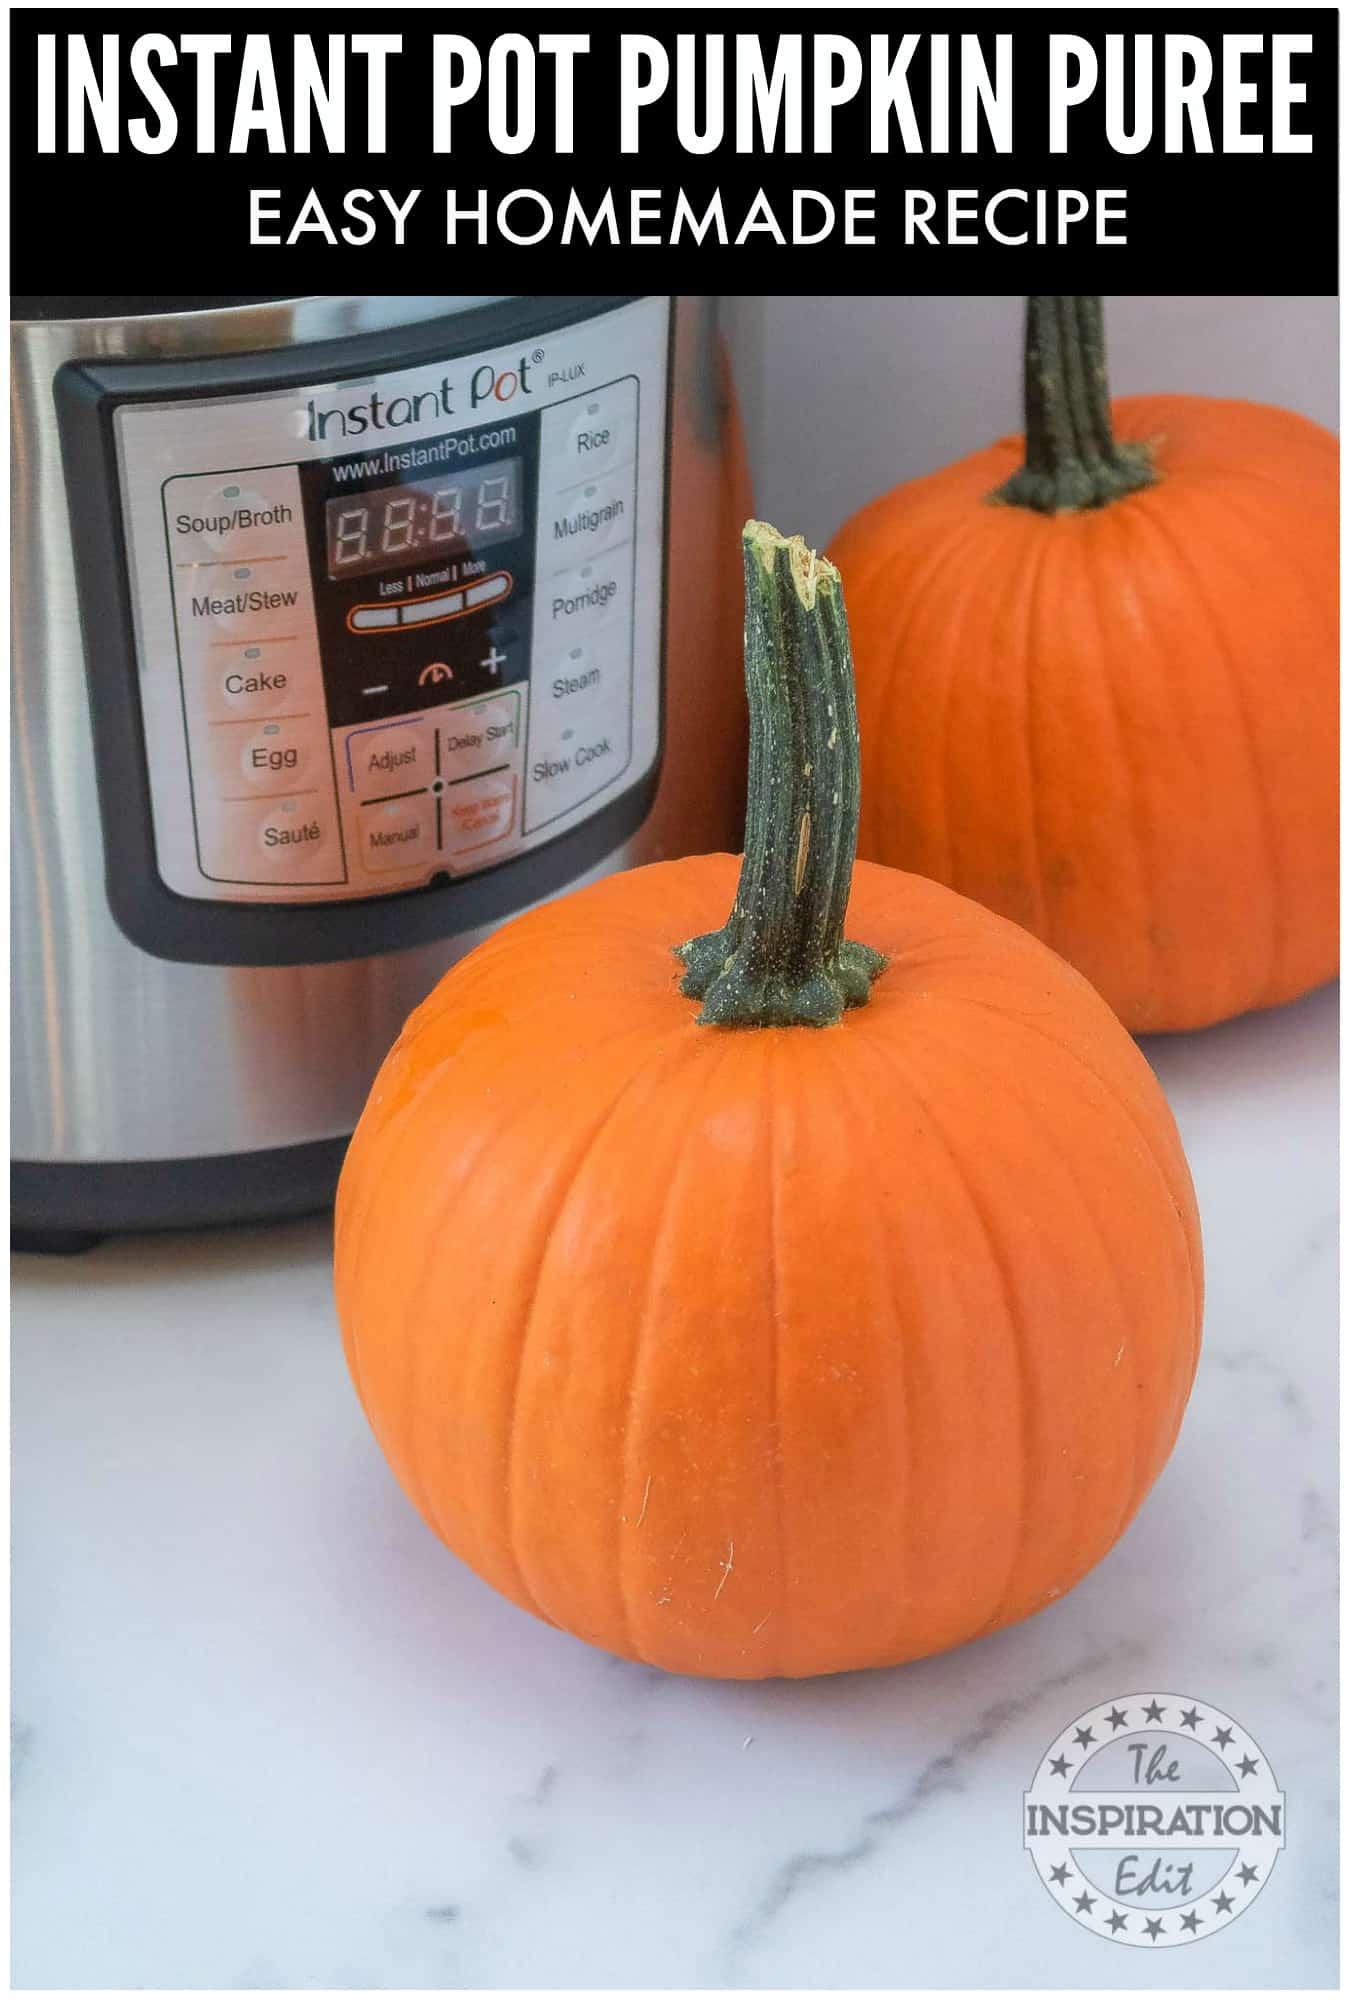 Homemade pureed pumpkin recipe